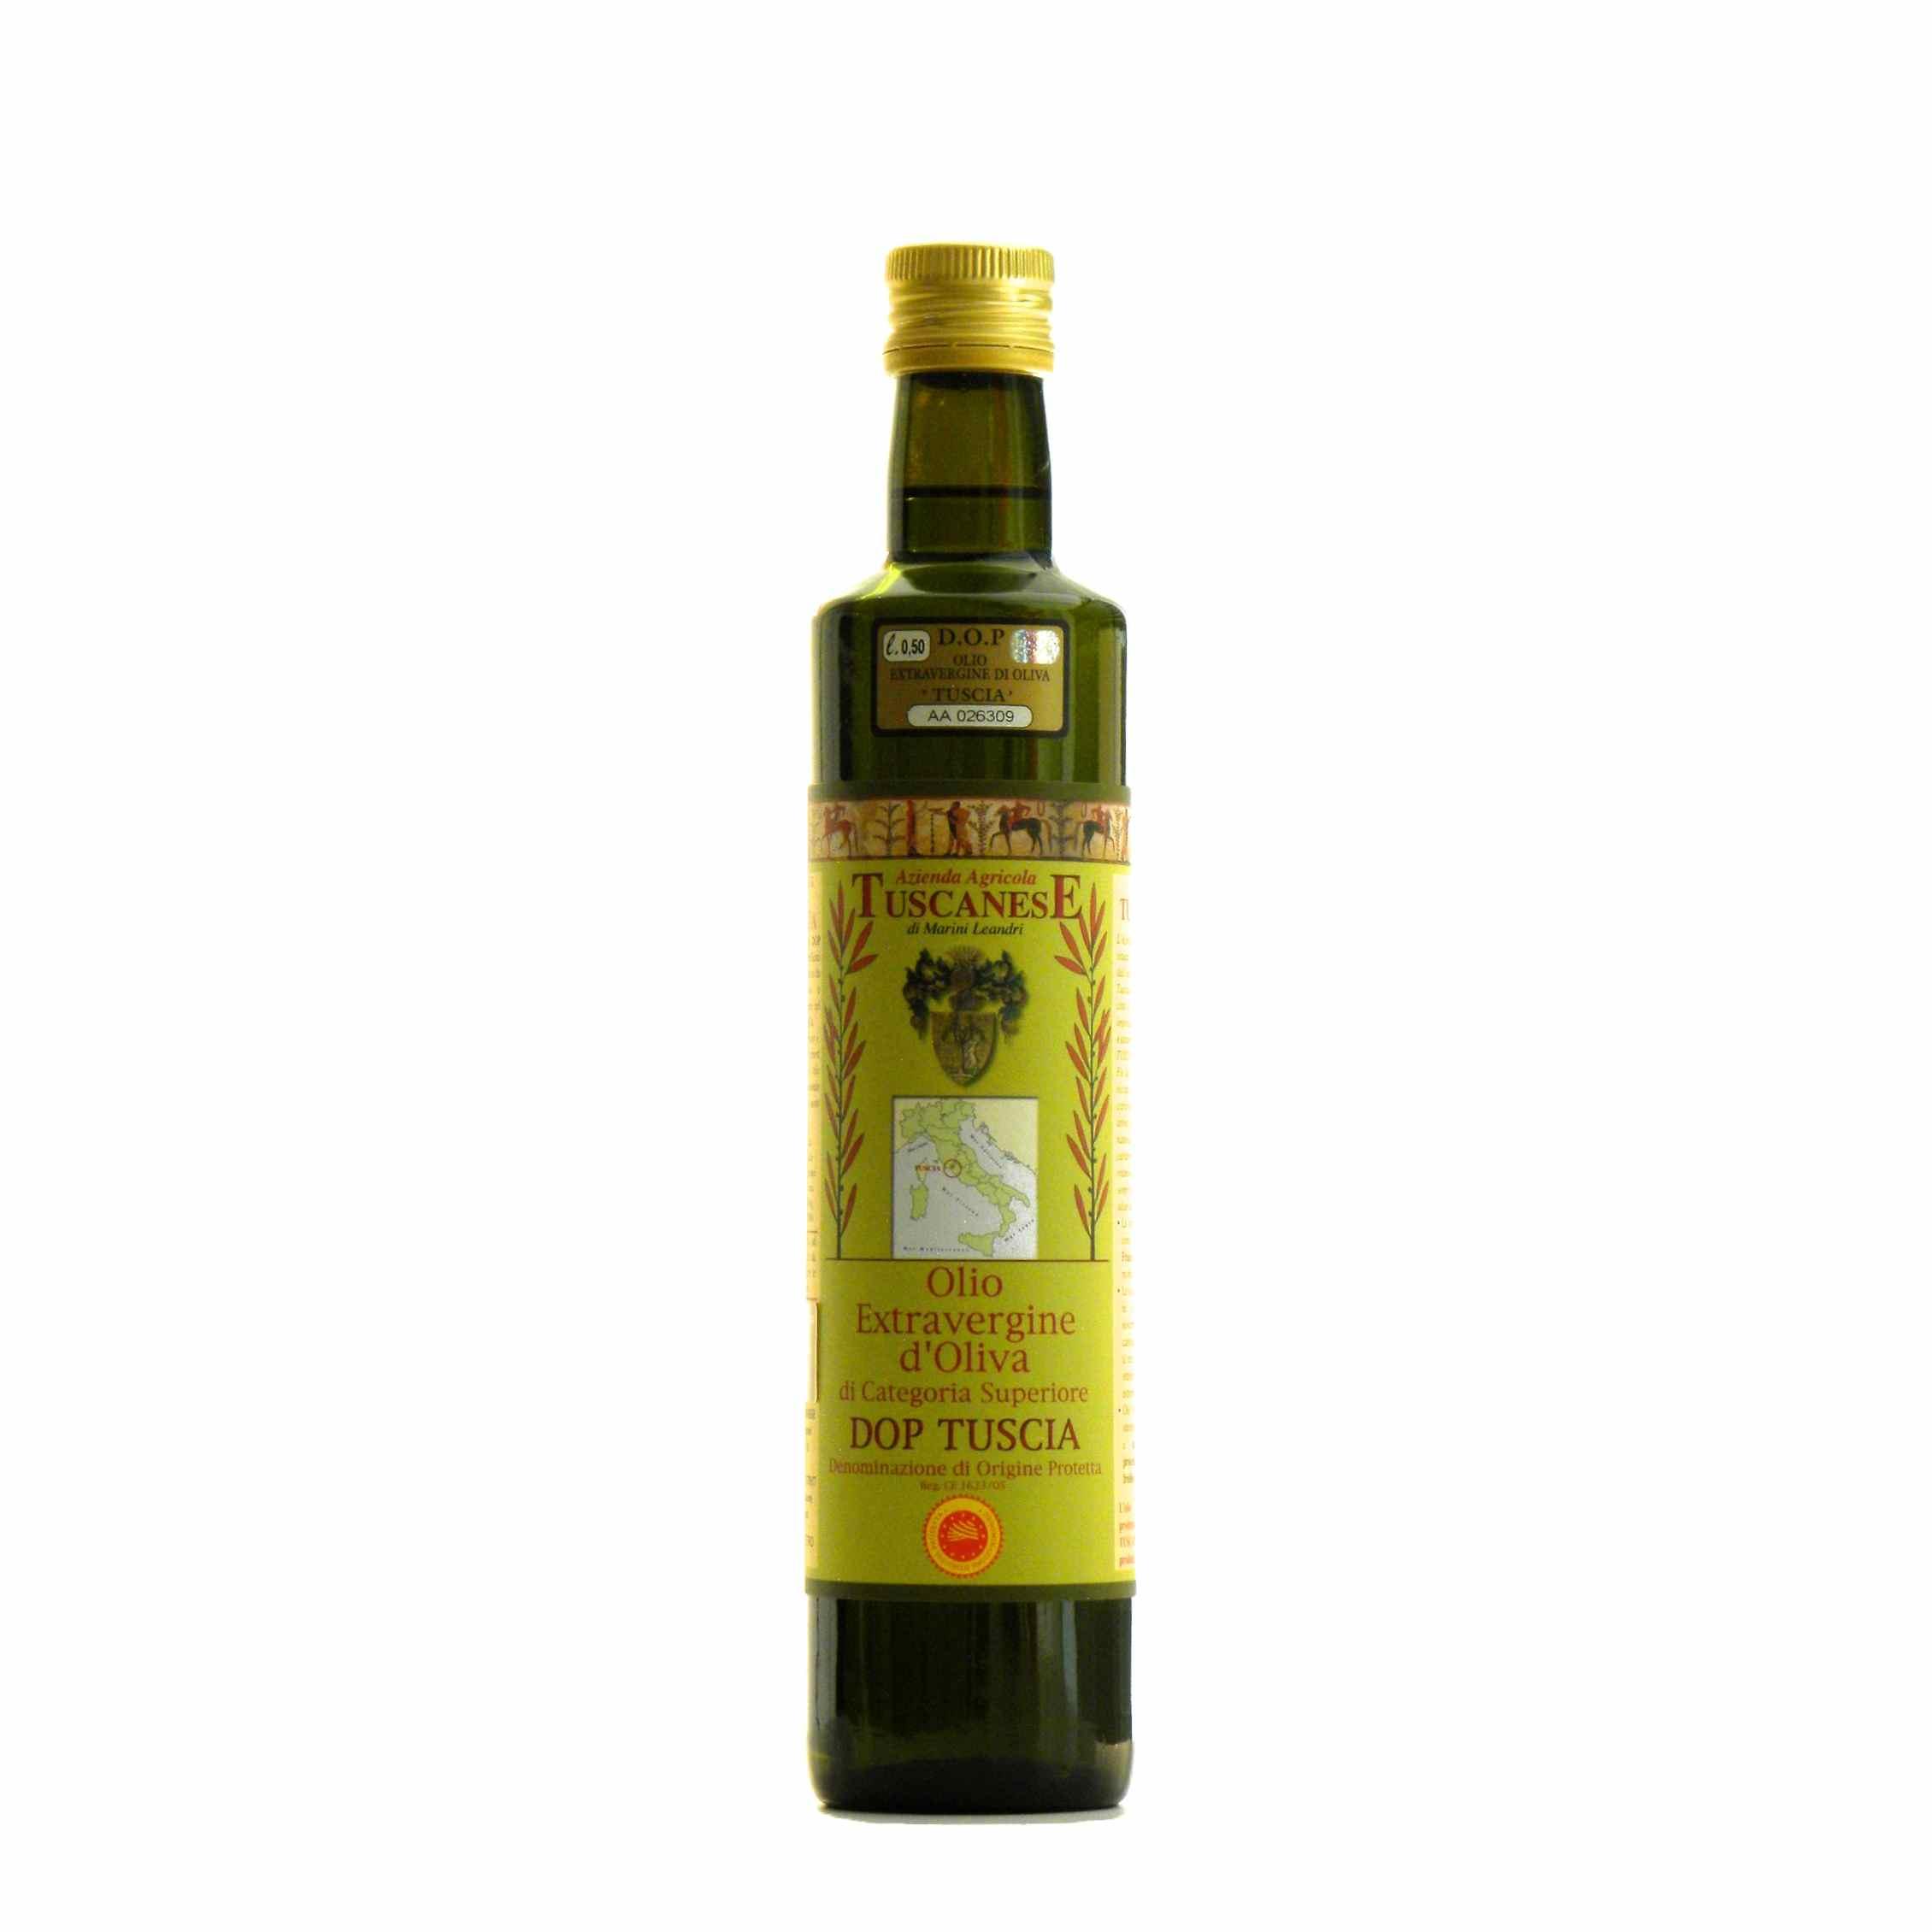 Tuscanese Olio Extravergine di oliva – Tuscanese Extra Virgin Olive Oil – Gustorotondo – Italian food boutique